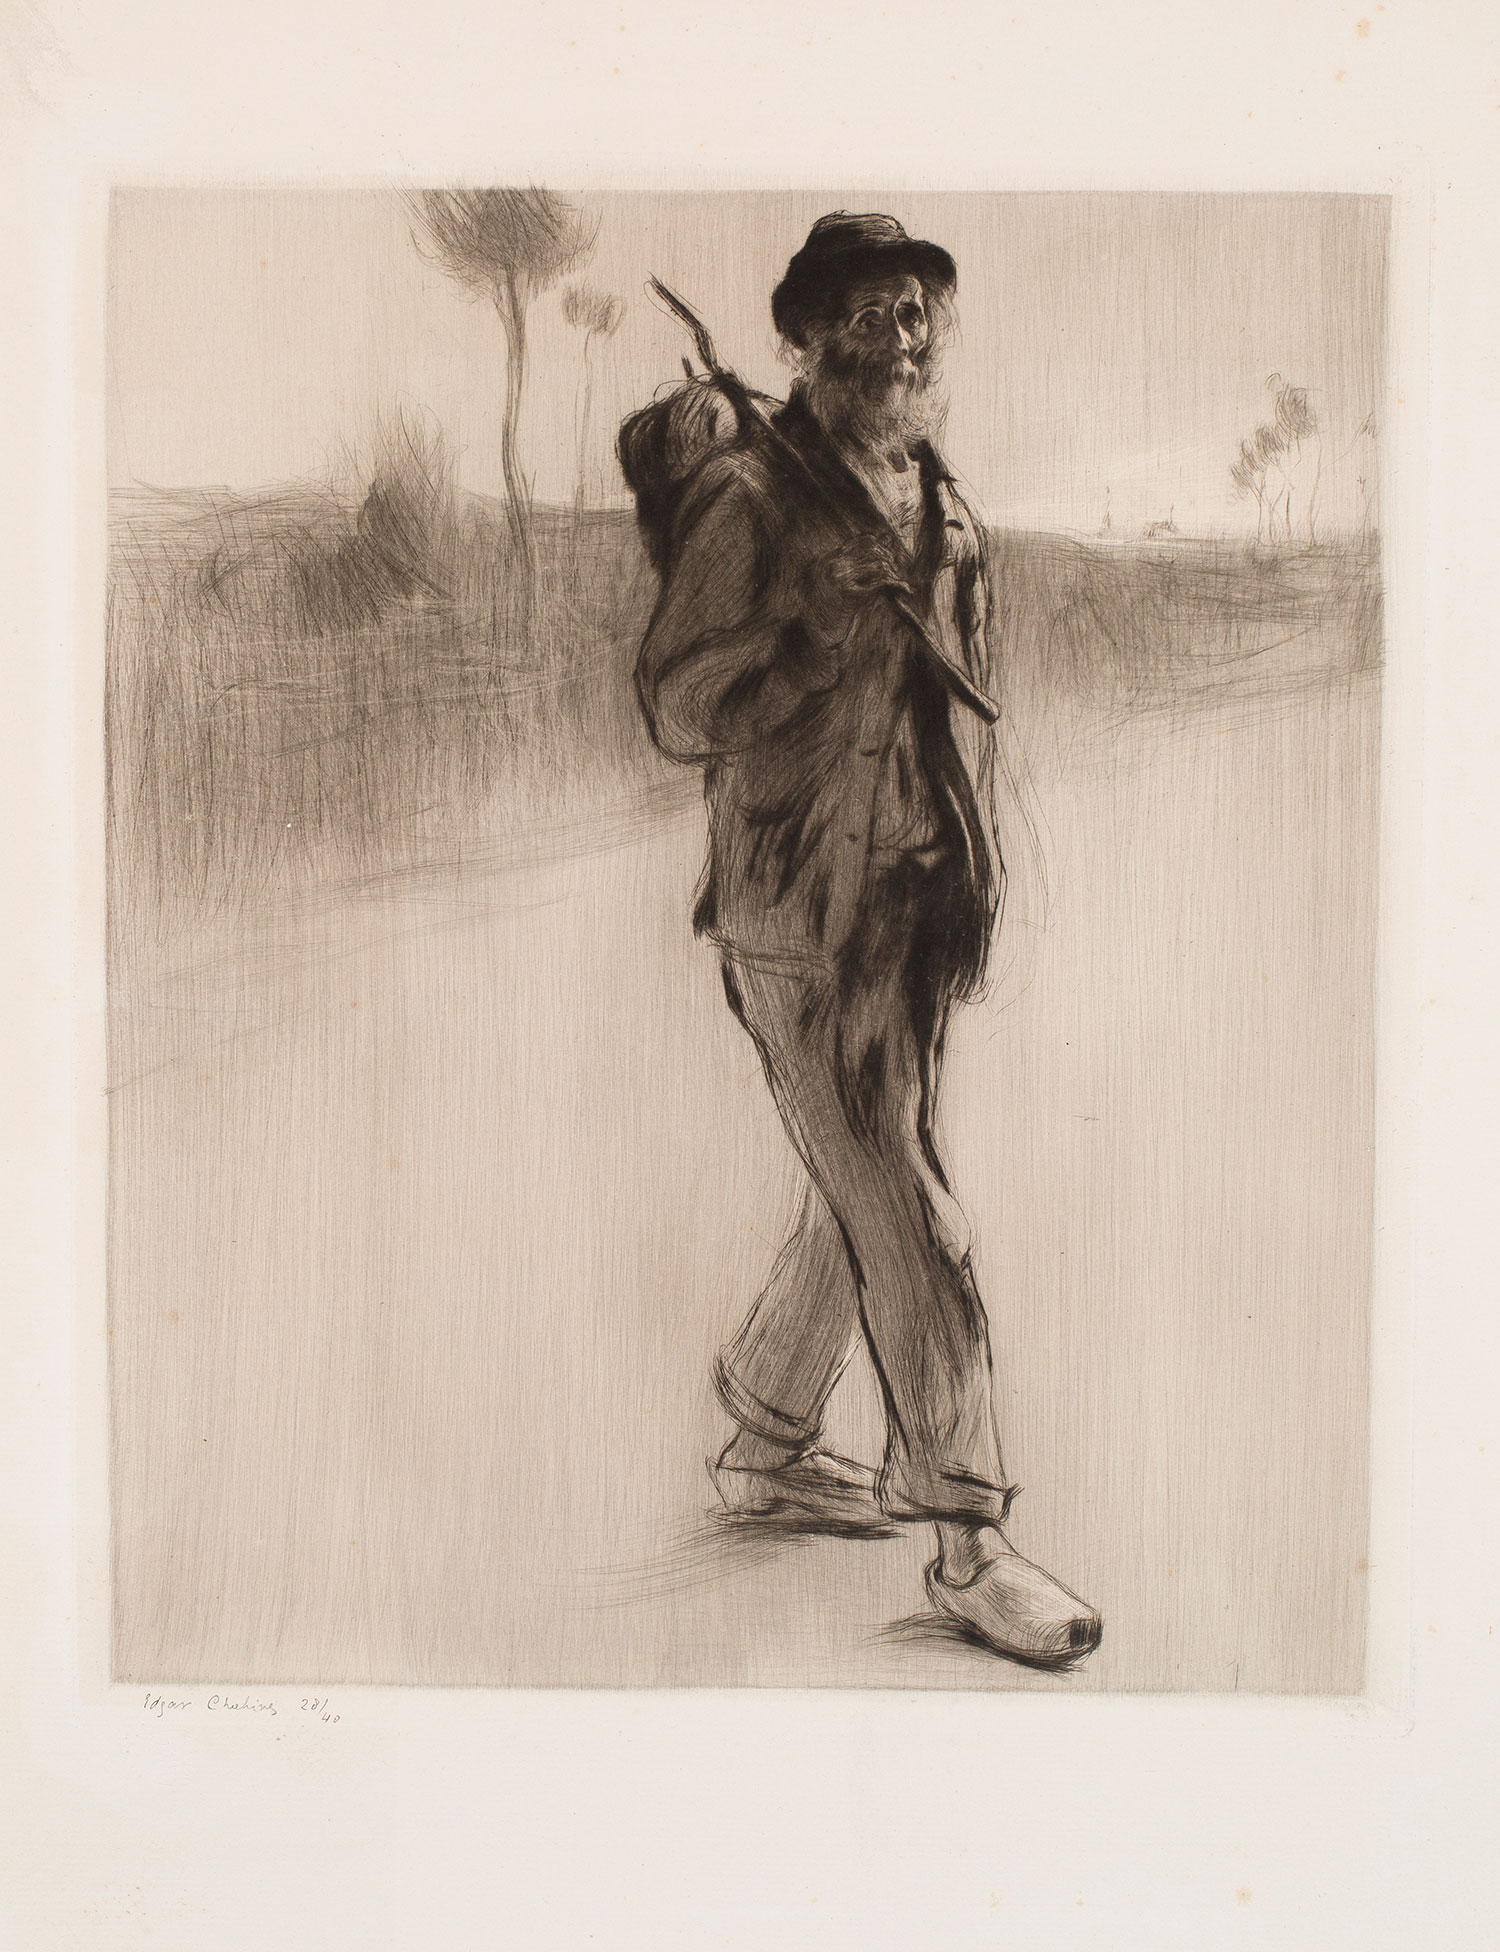 Un vagabundo, Edgard Chahine